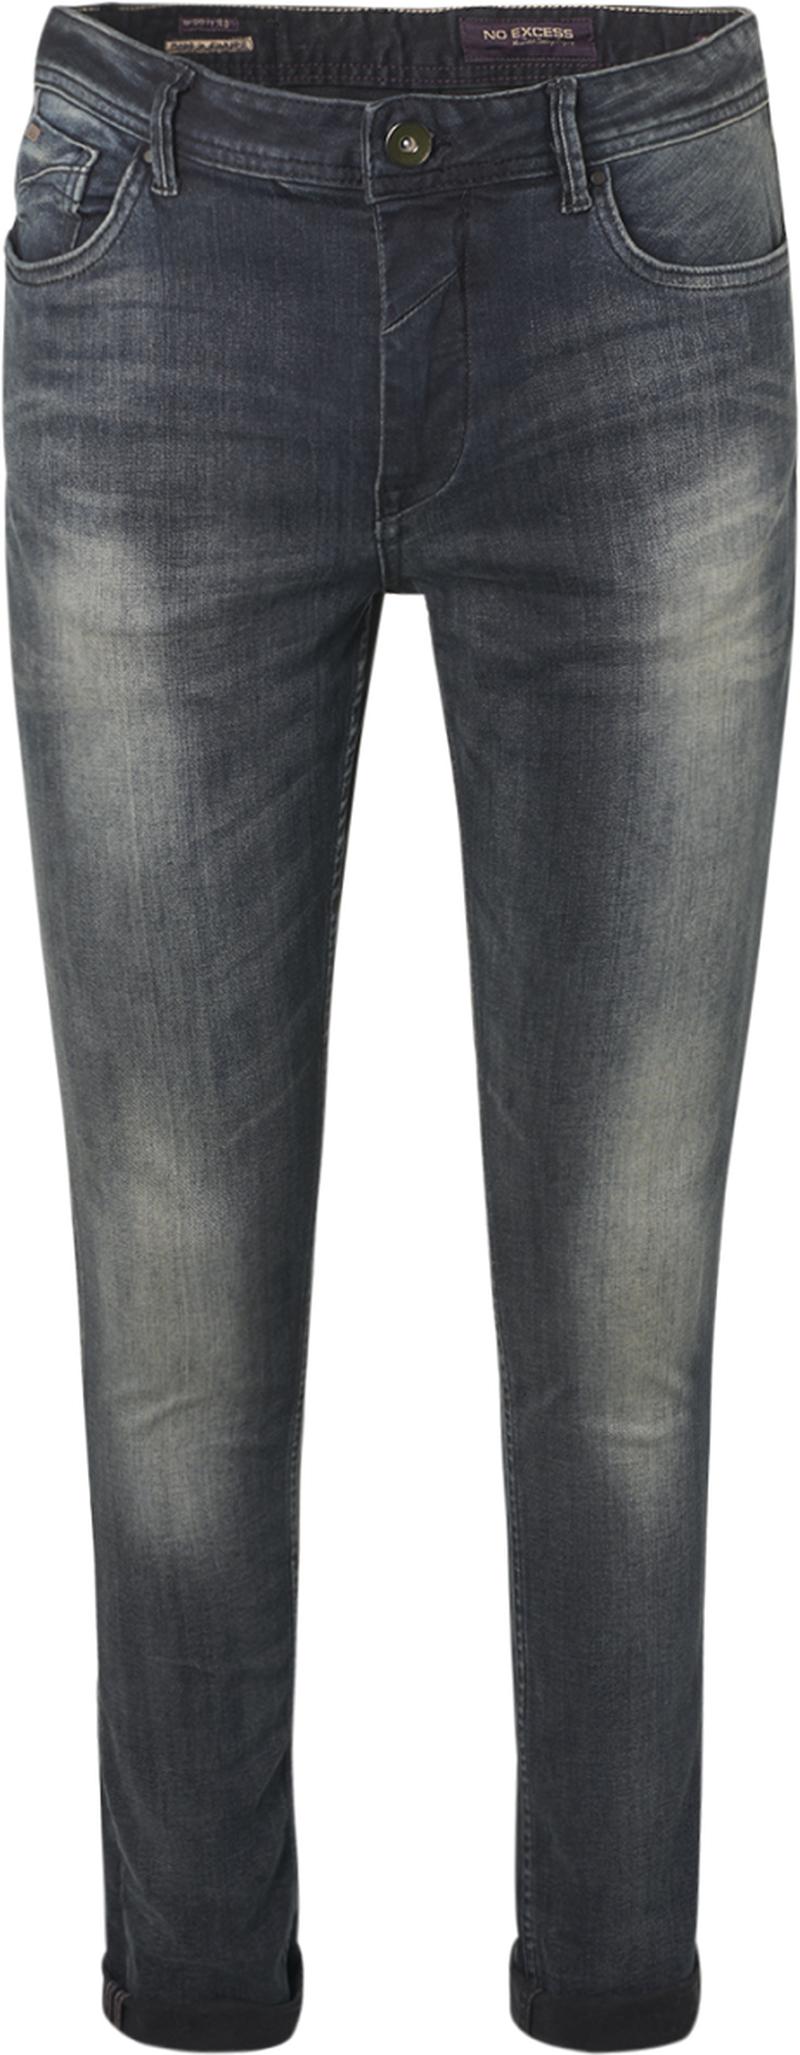 No-Excess Jeans 711 Grey Denim